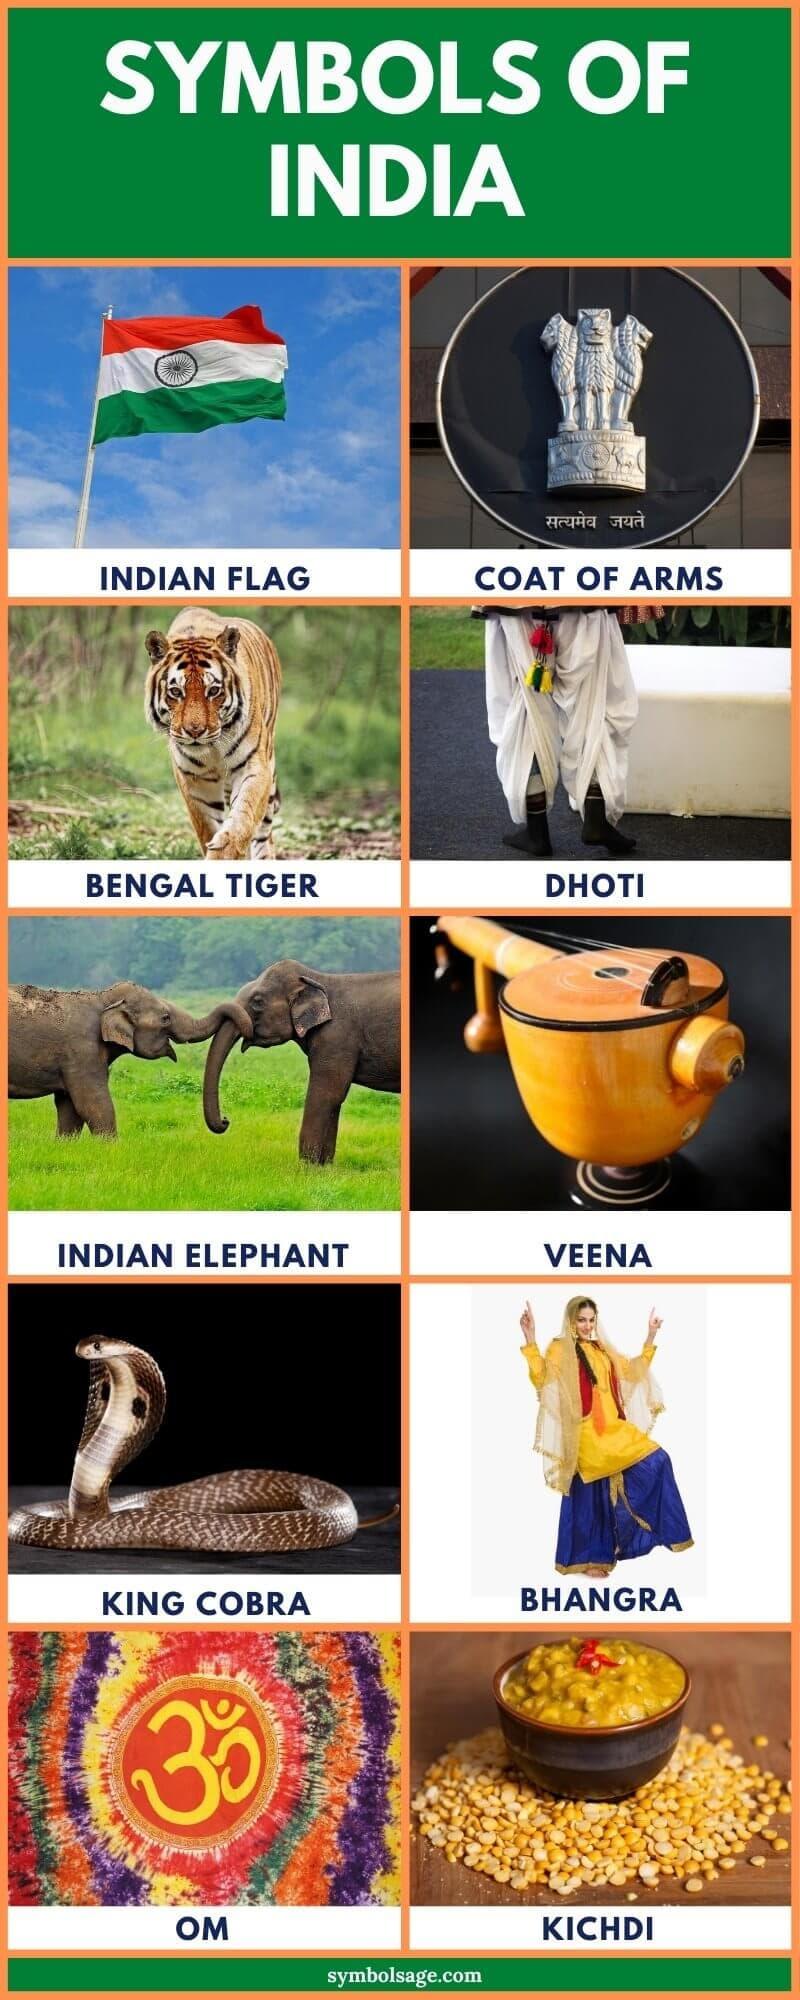 Symbols of India list